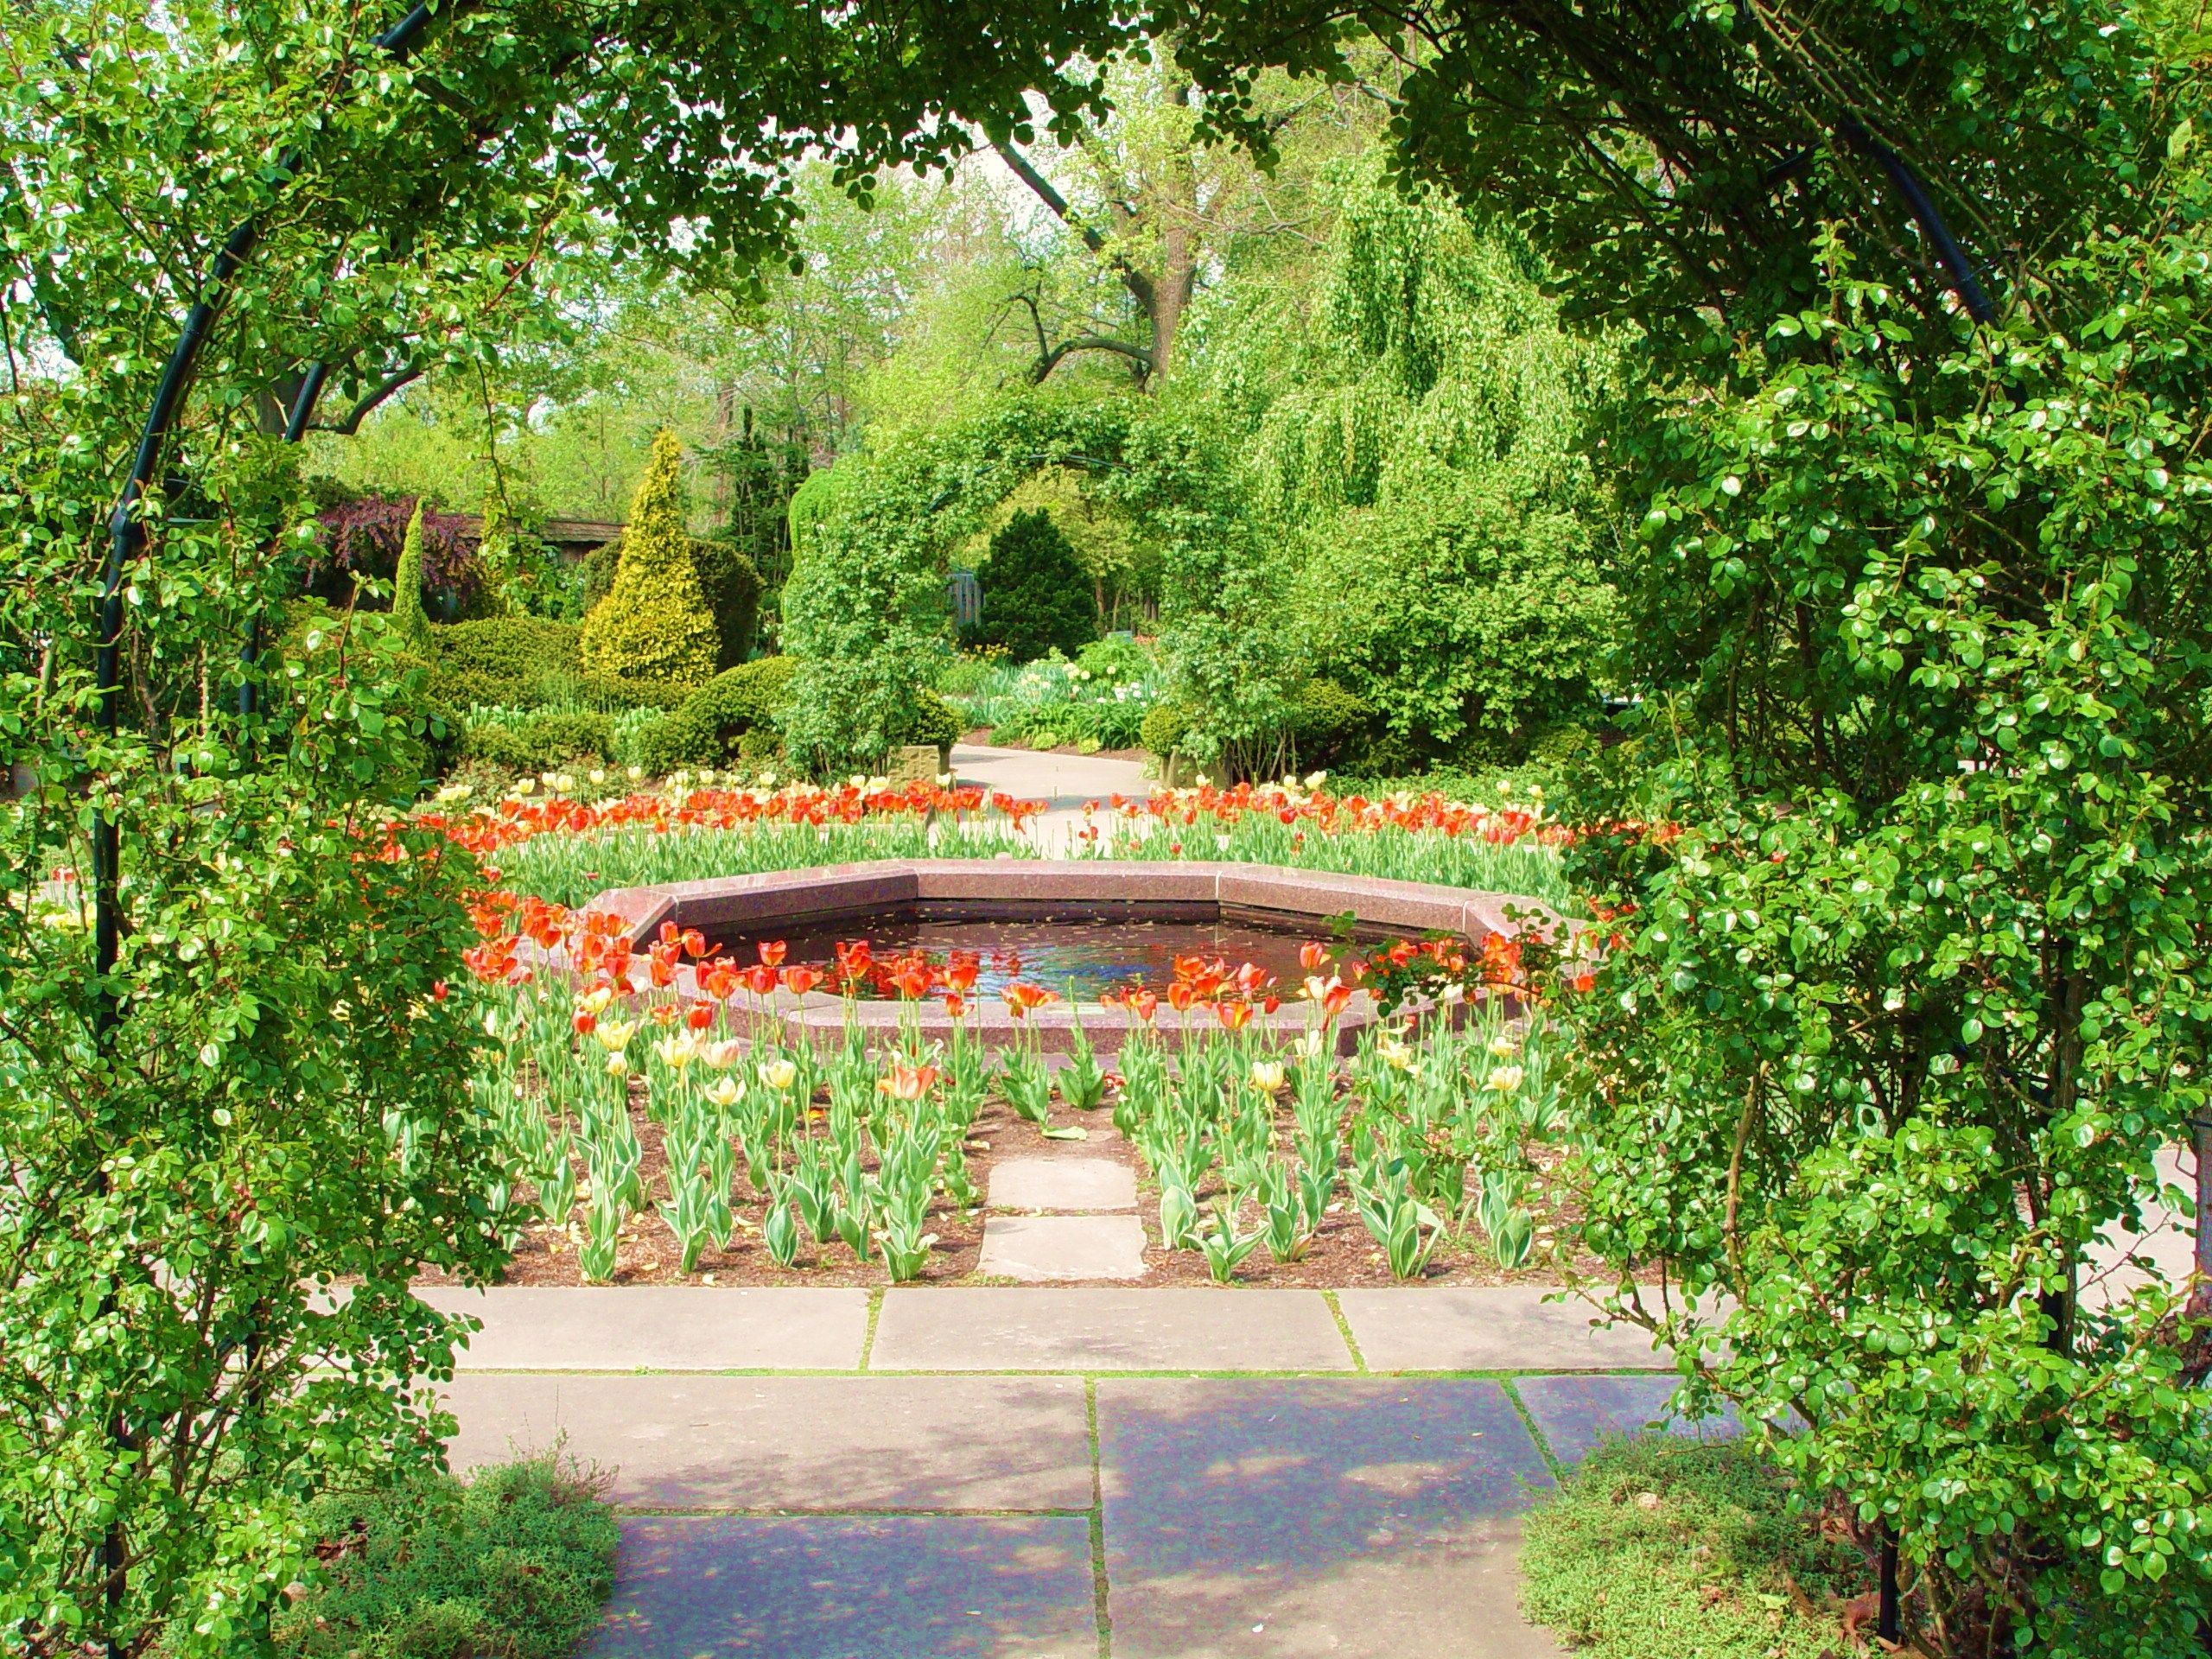 c4a59530fd0a18a71a369c01ae64c386 - How Much Are The Botanical Gardens